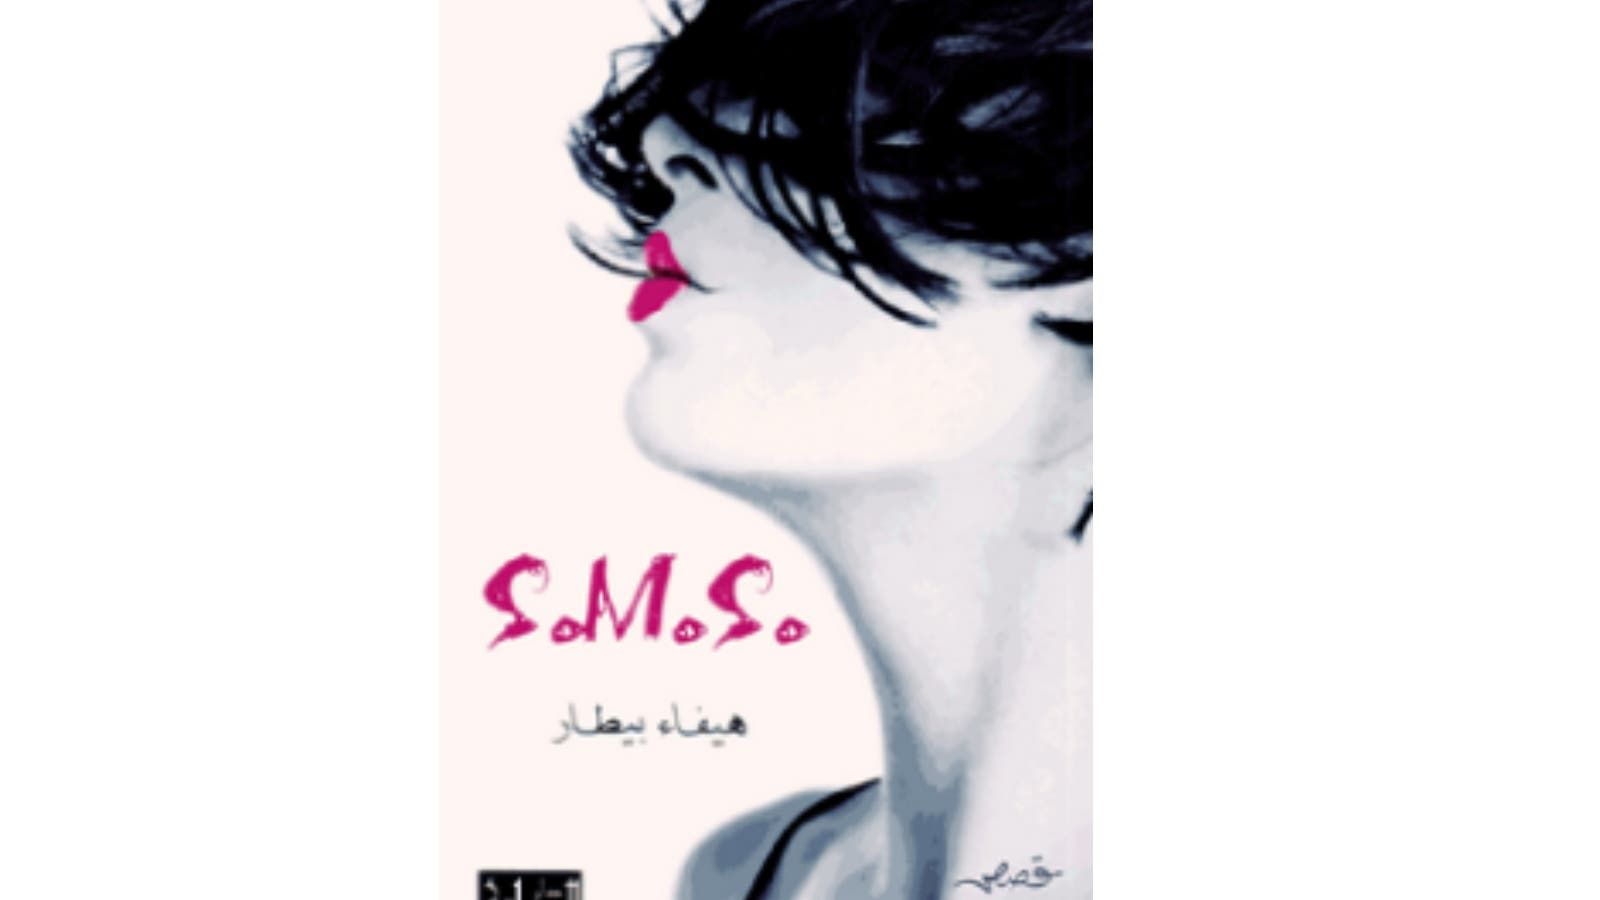 S M S اس ام اس تأليف هيفاء بيطار Movie Posters Art Poster